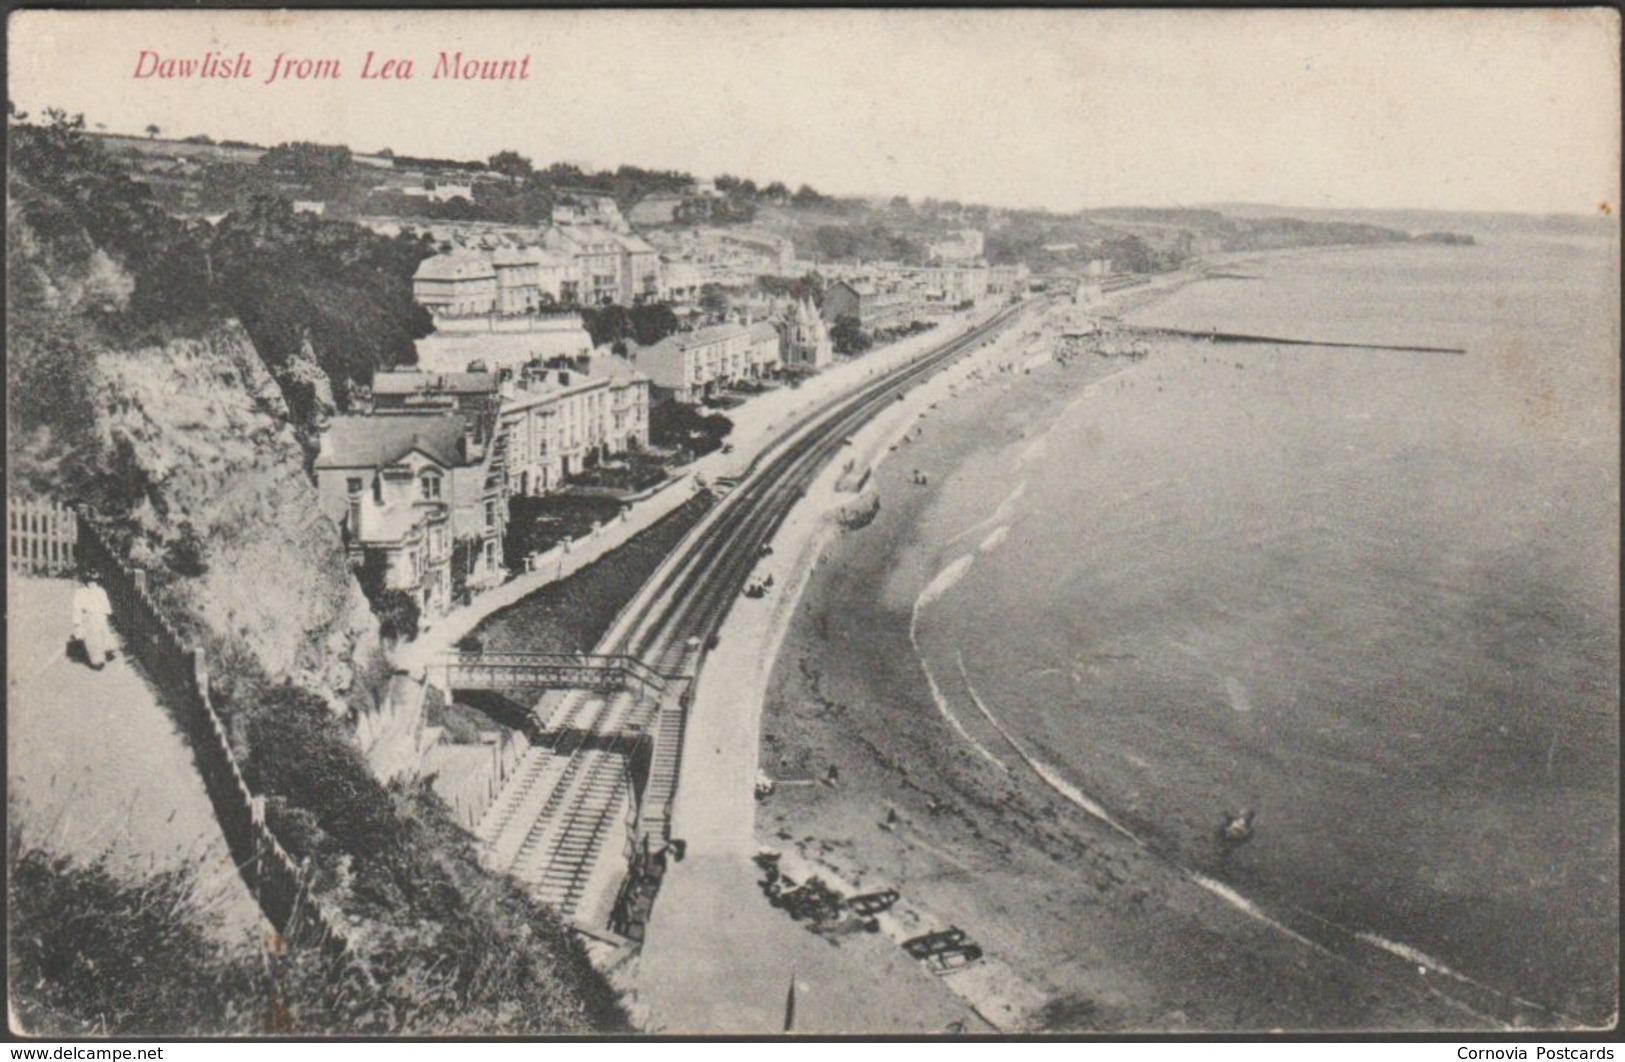 Dawlish From Lea Mount, Devon, 1907 - Chapman Postcard - England